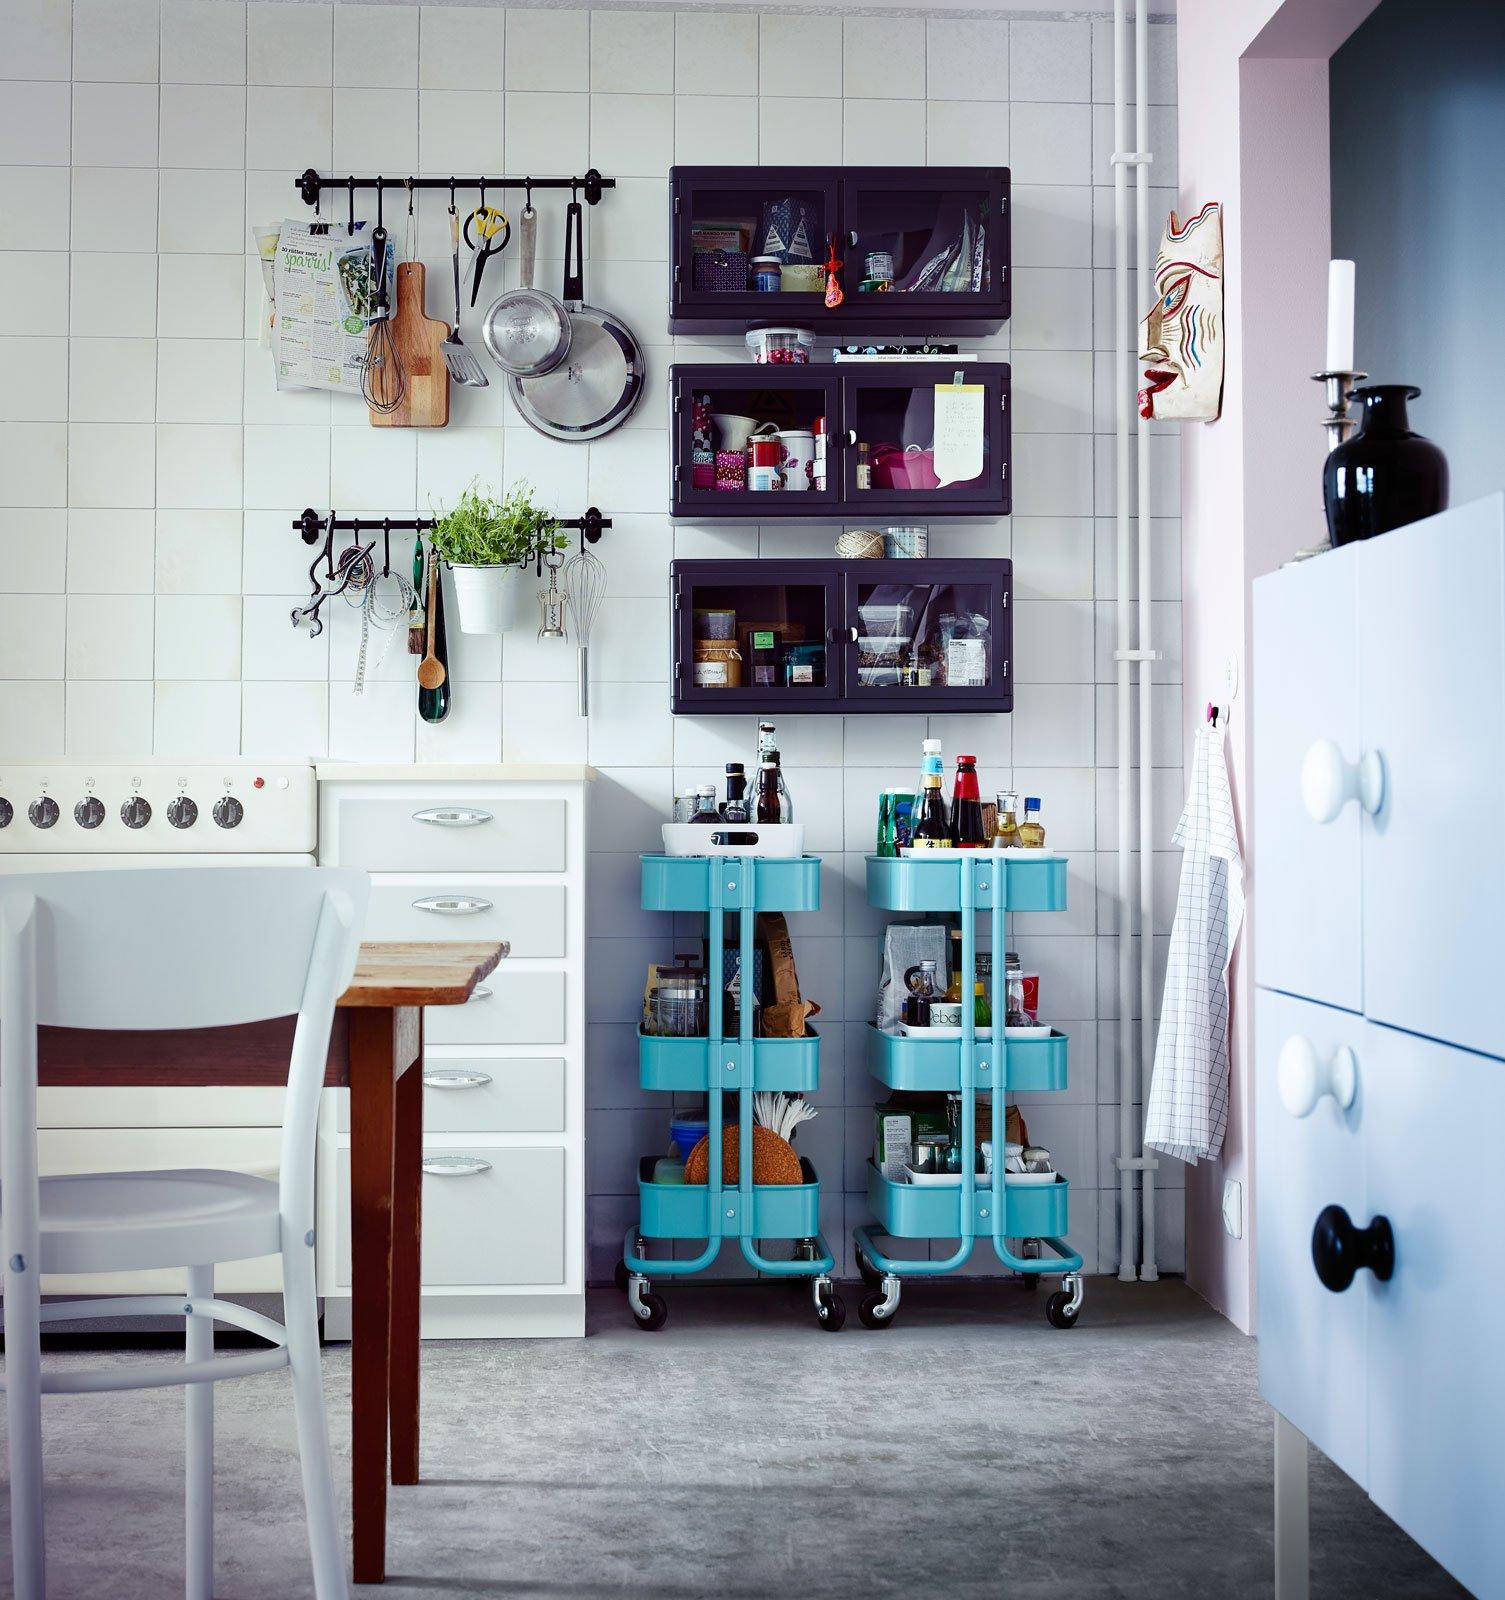 Küchenwagen Ikea | acjsilva.com